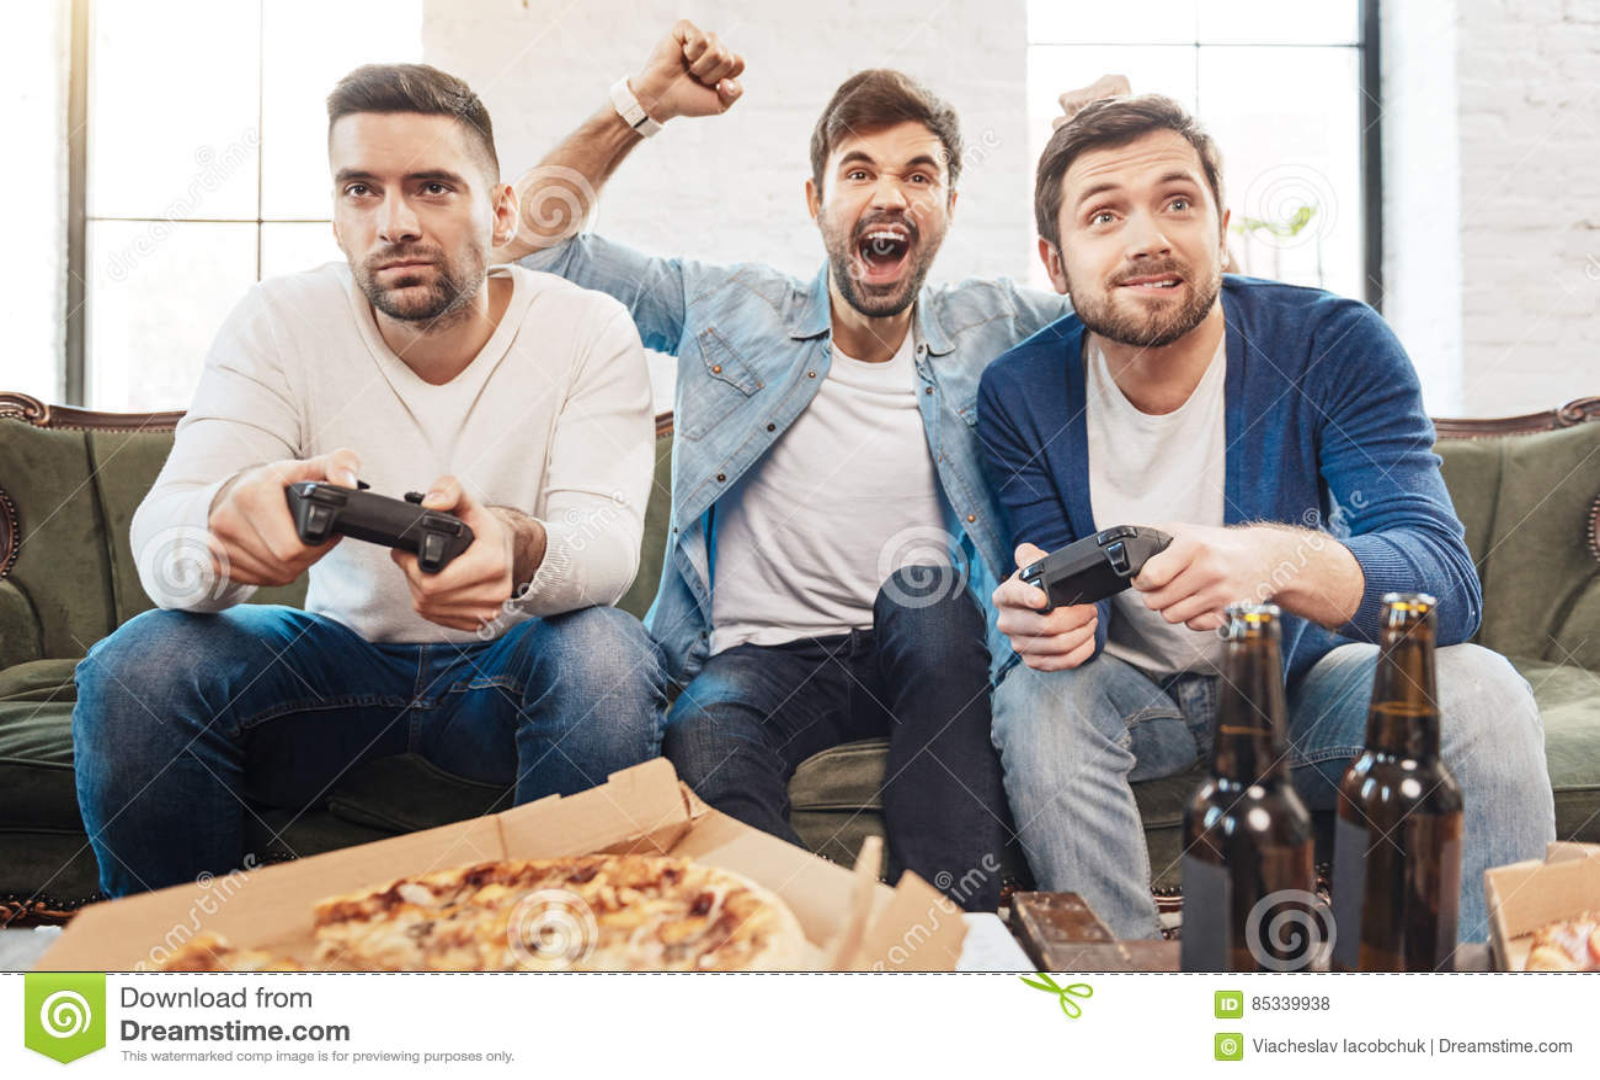 do guys play games